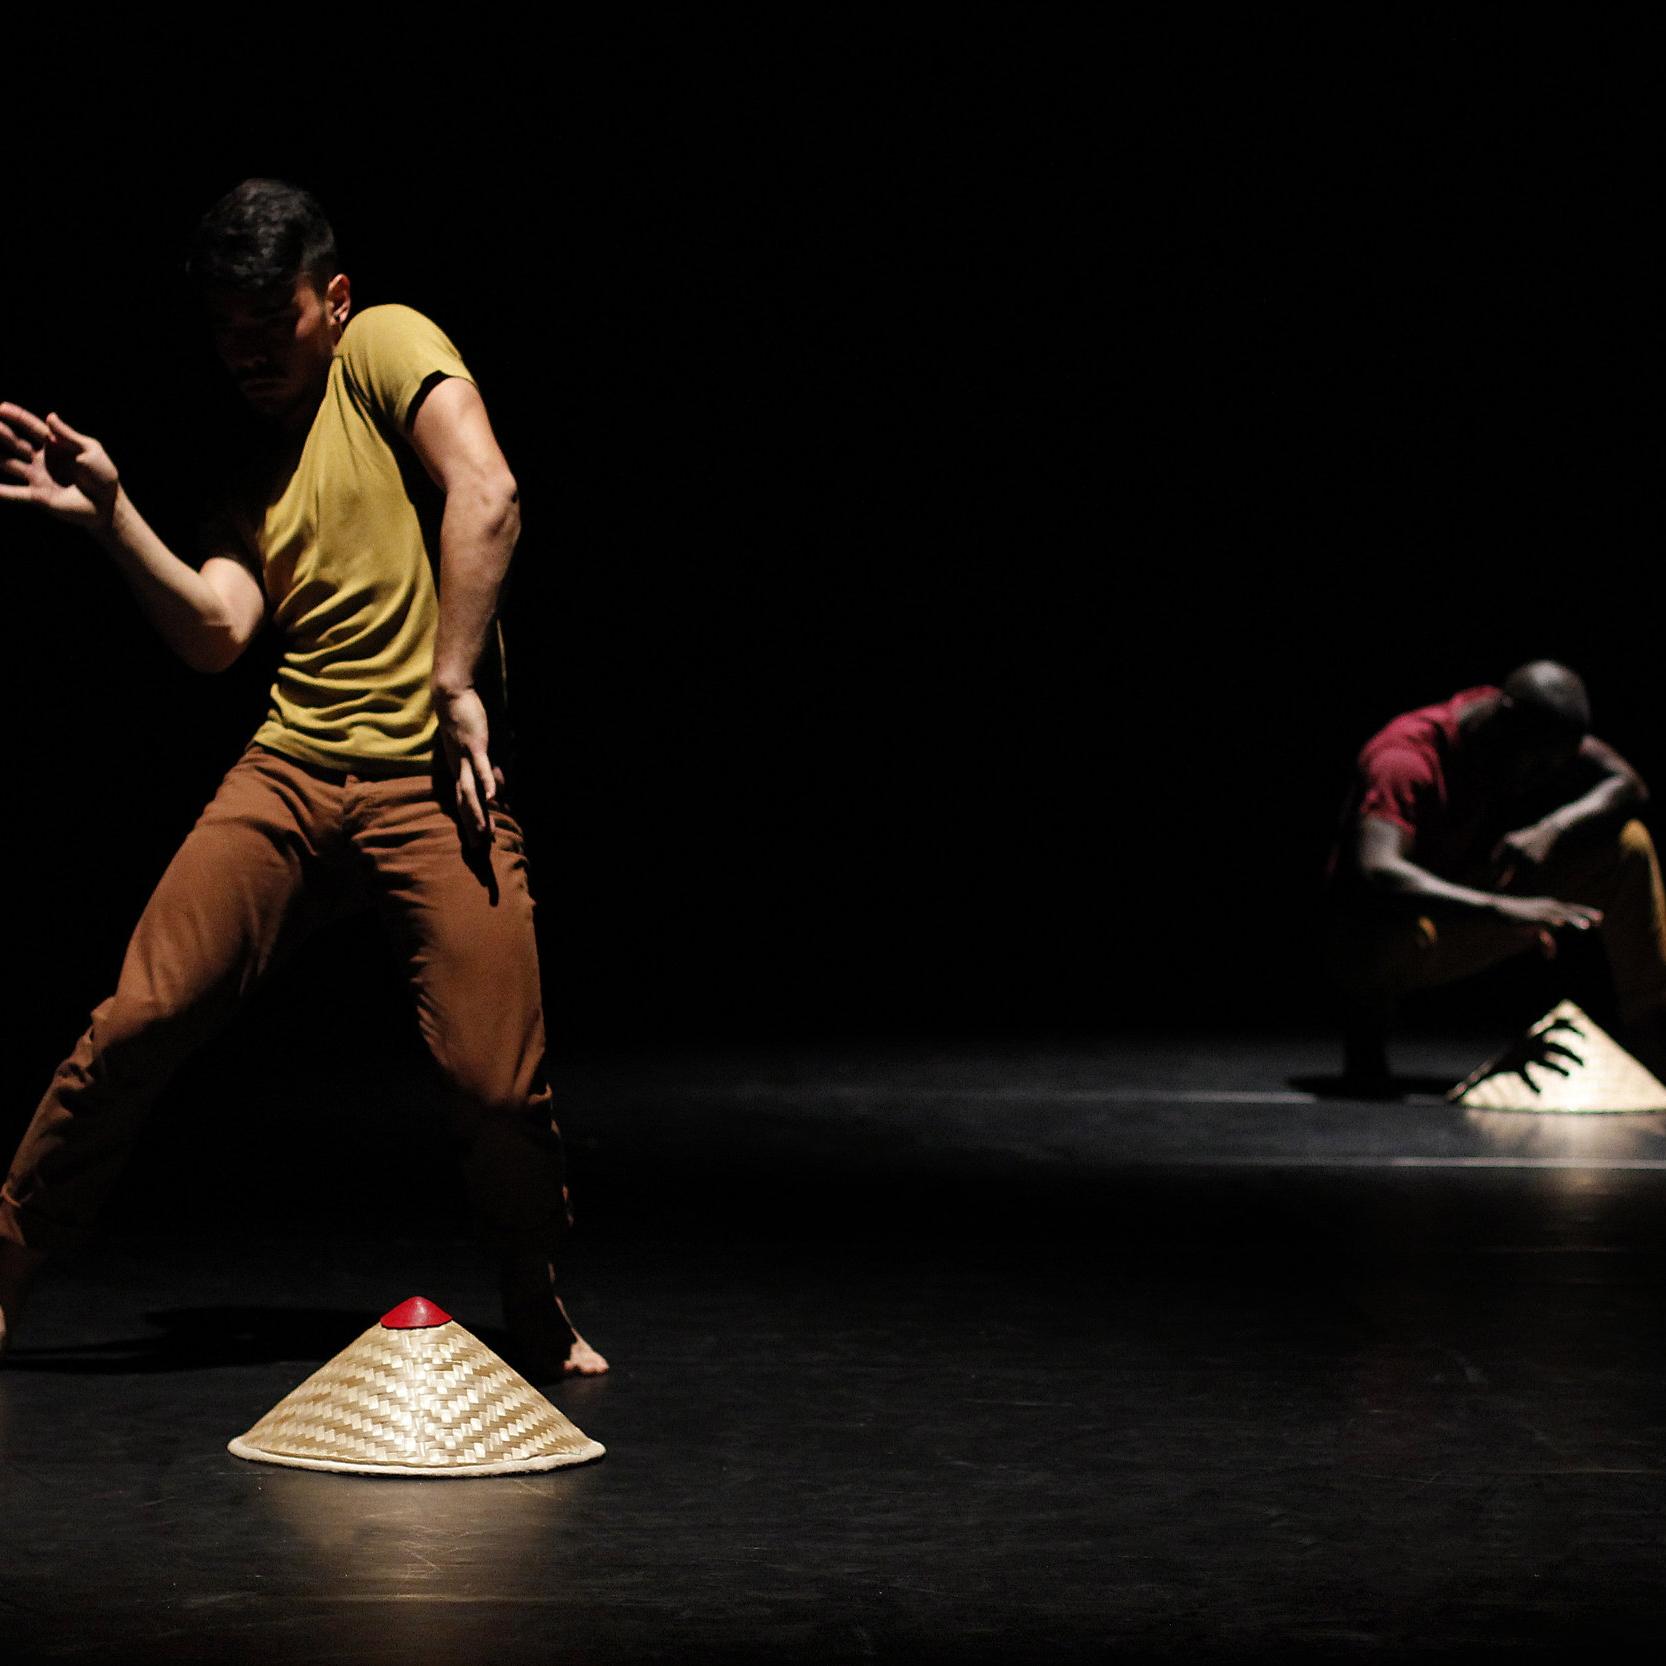 SAME SAME - Création 2O14 pour 2 danseurs